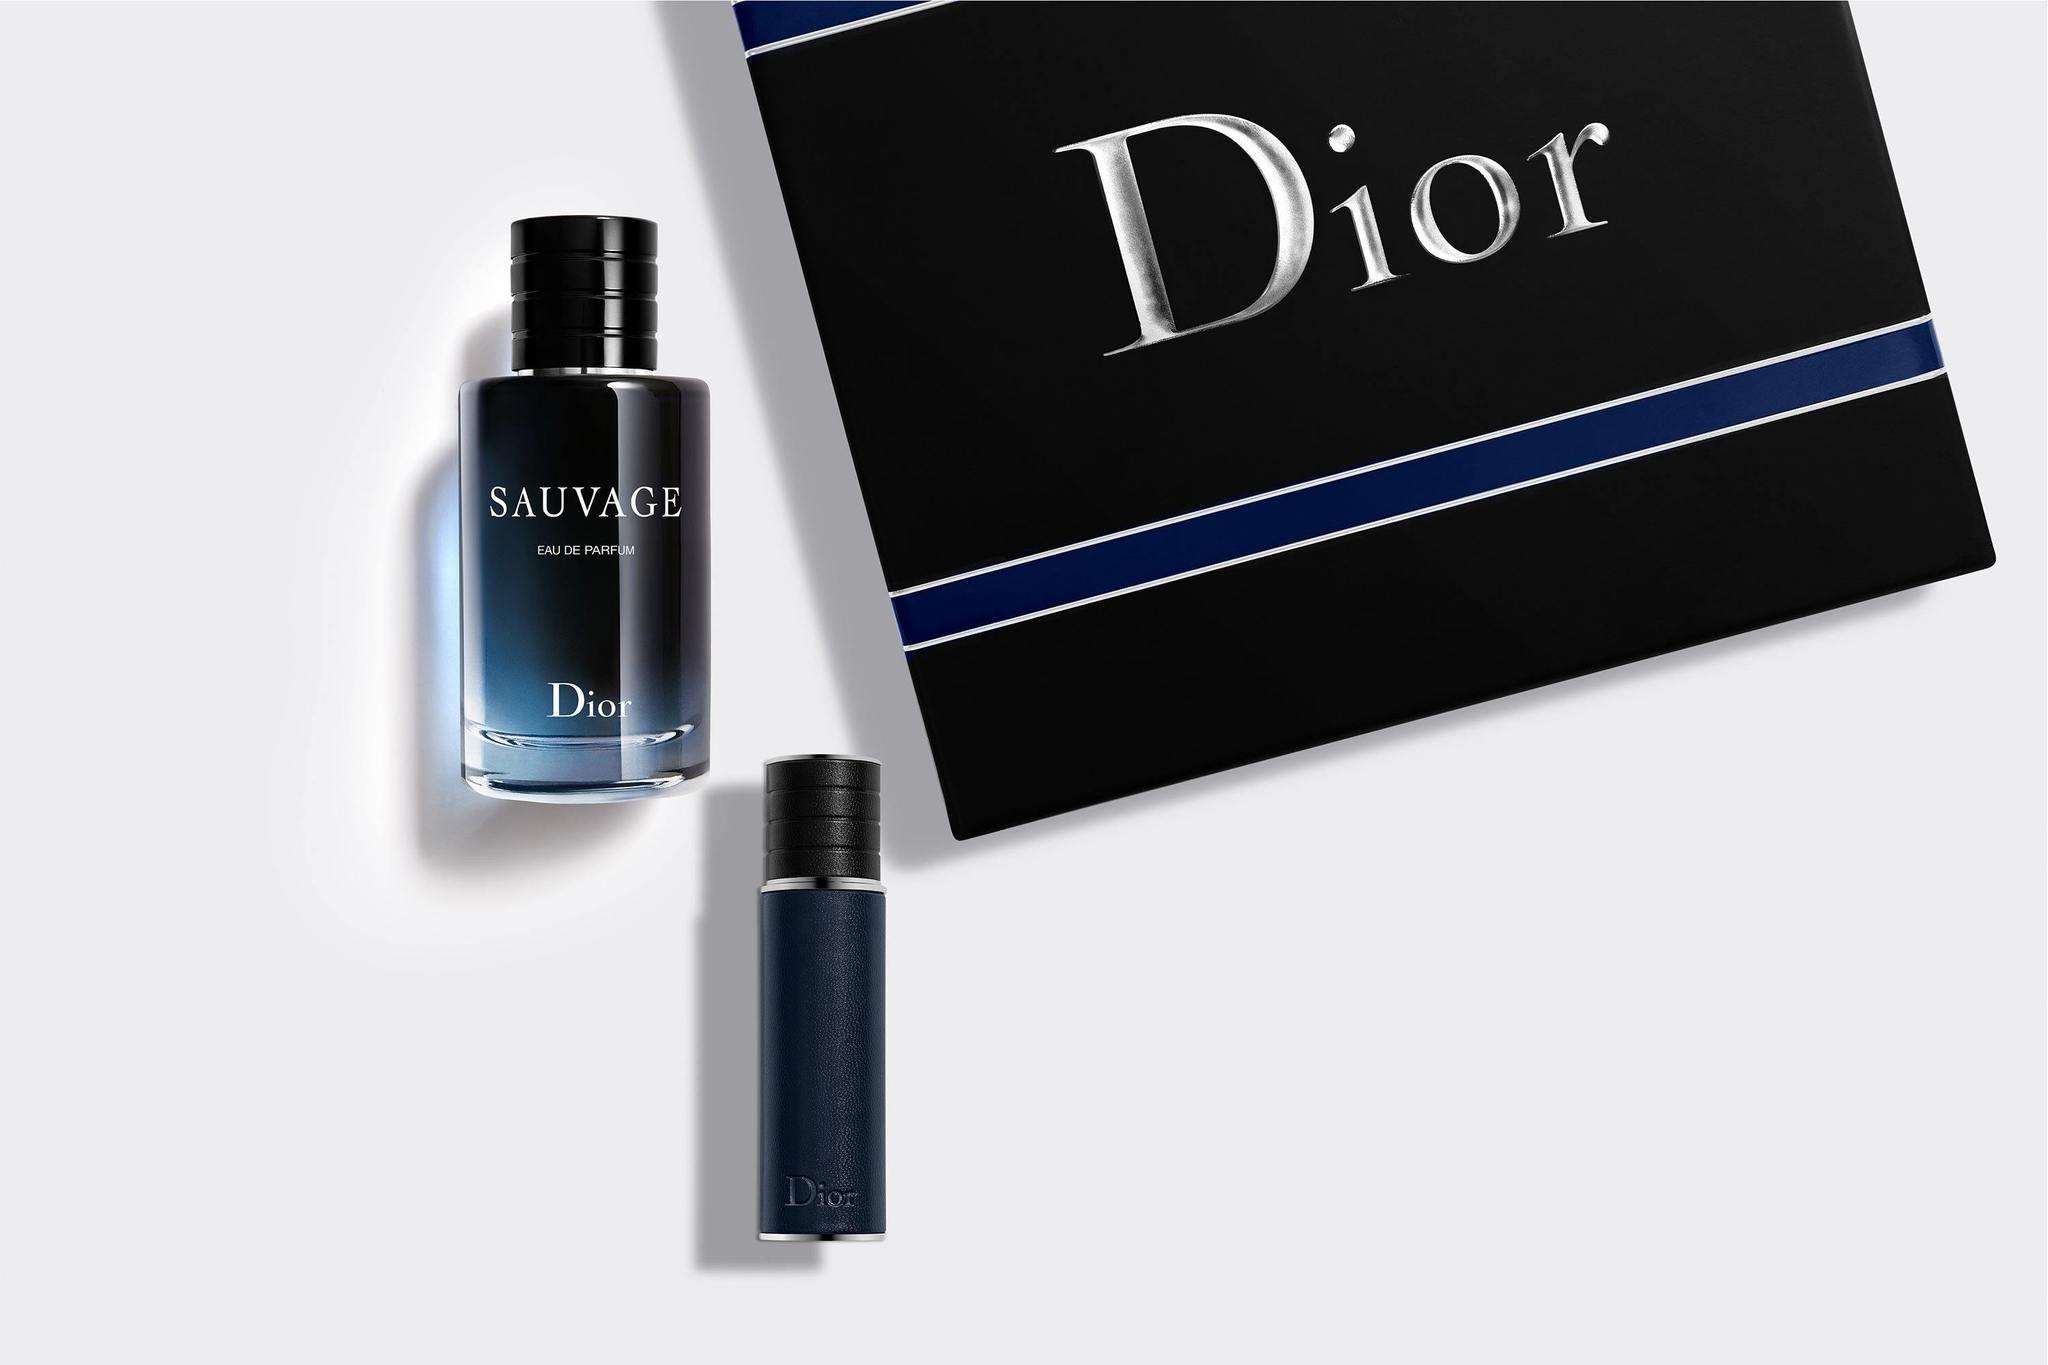 dior-men's-3-in-1-gift-set